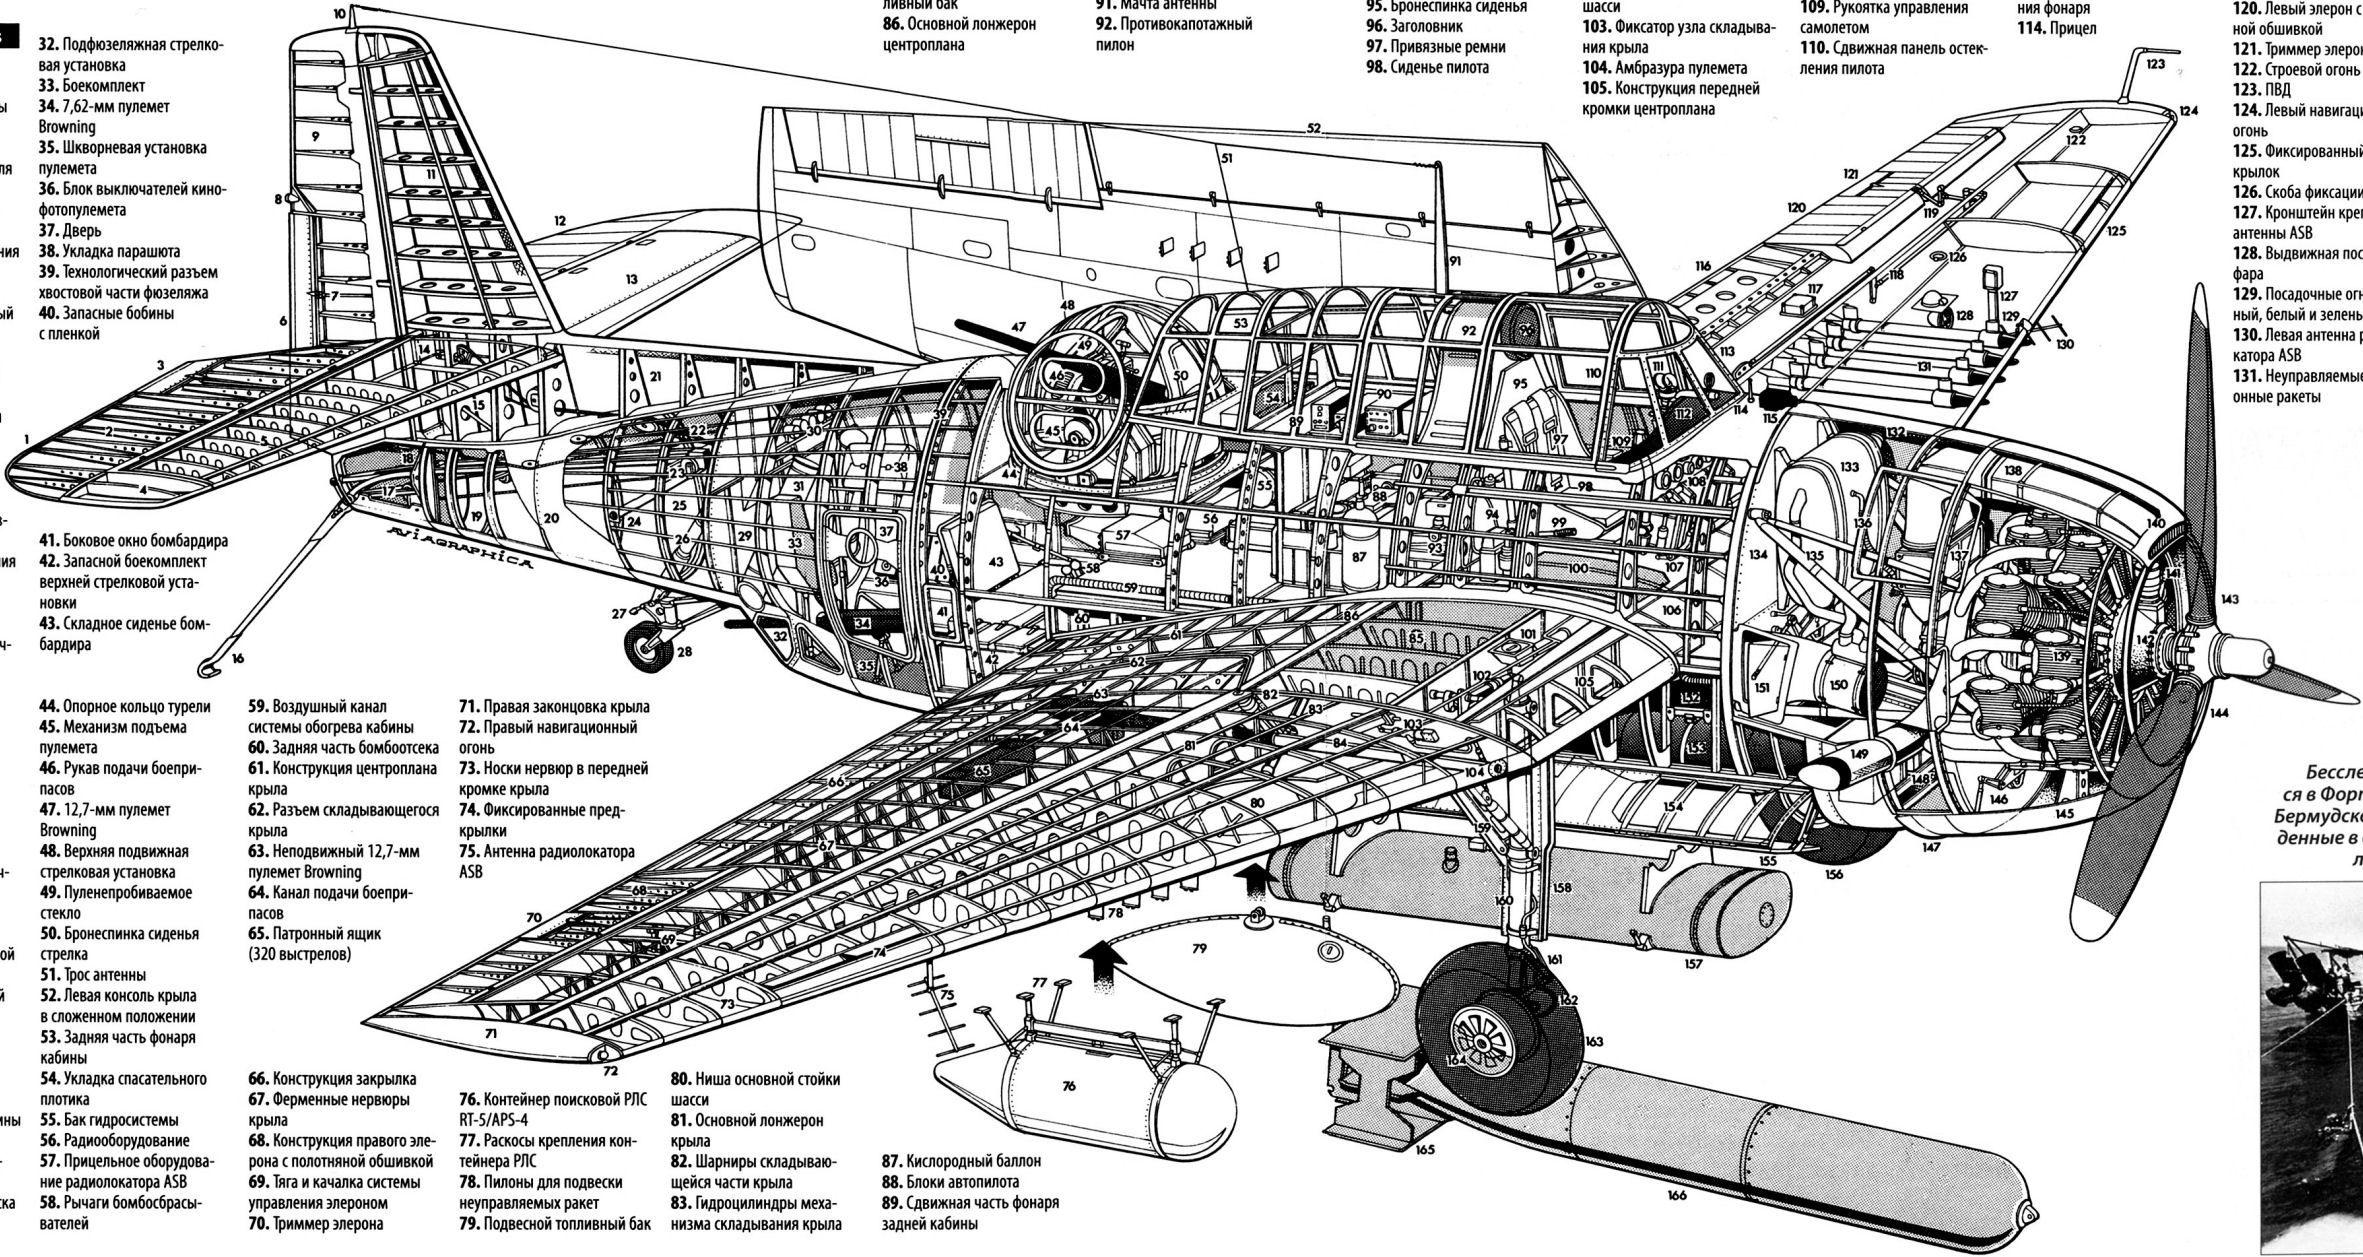 Aircarft Cutaway Avion Militaire Seconde Guerre Mondiale Guerre 39 45